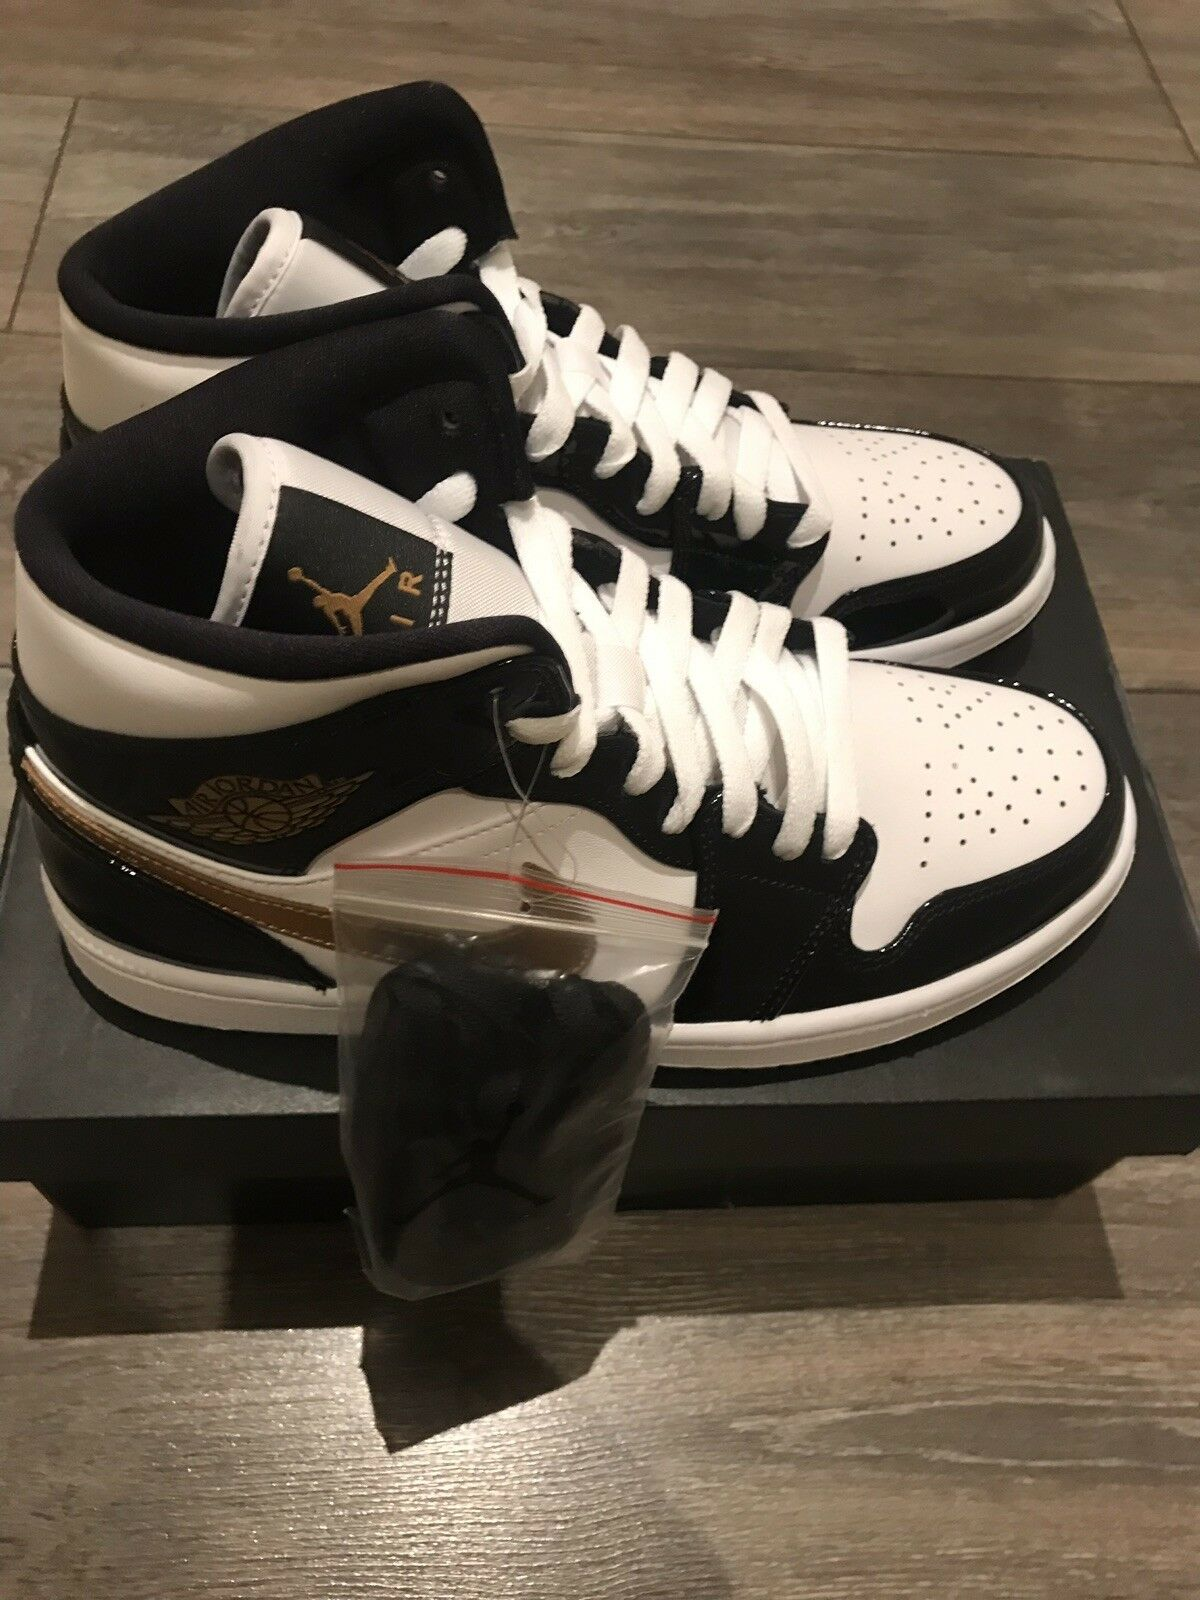 Brand New Jordan 1 Mid Black White gold Patent   UK 9.5